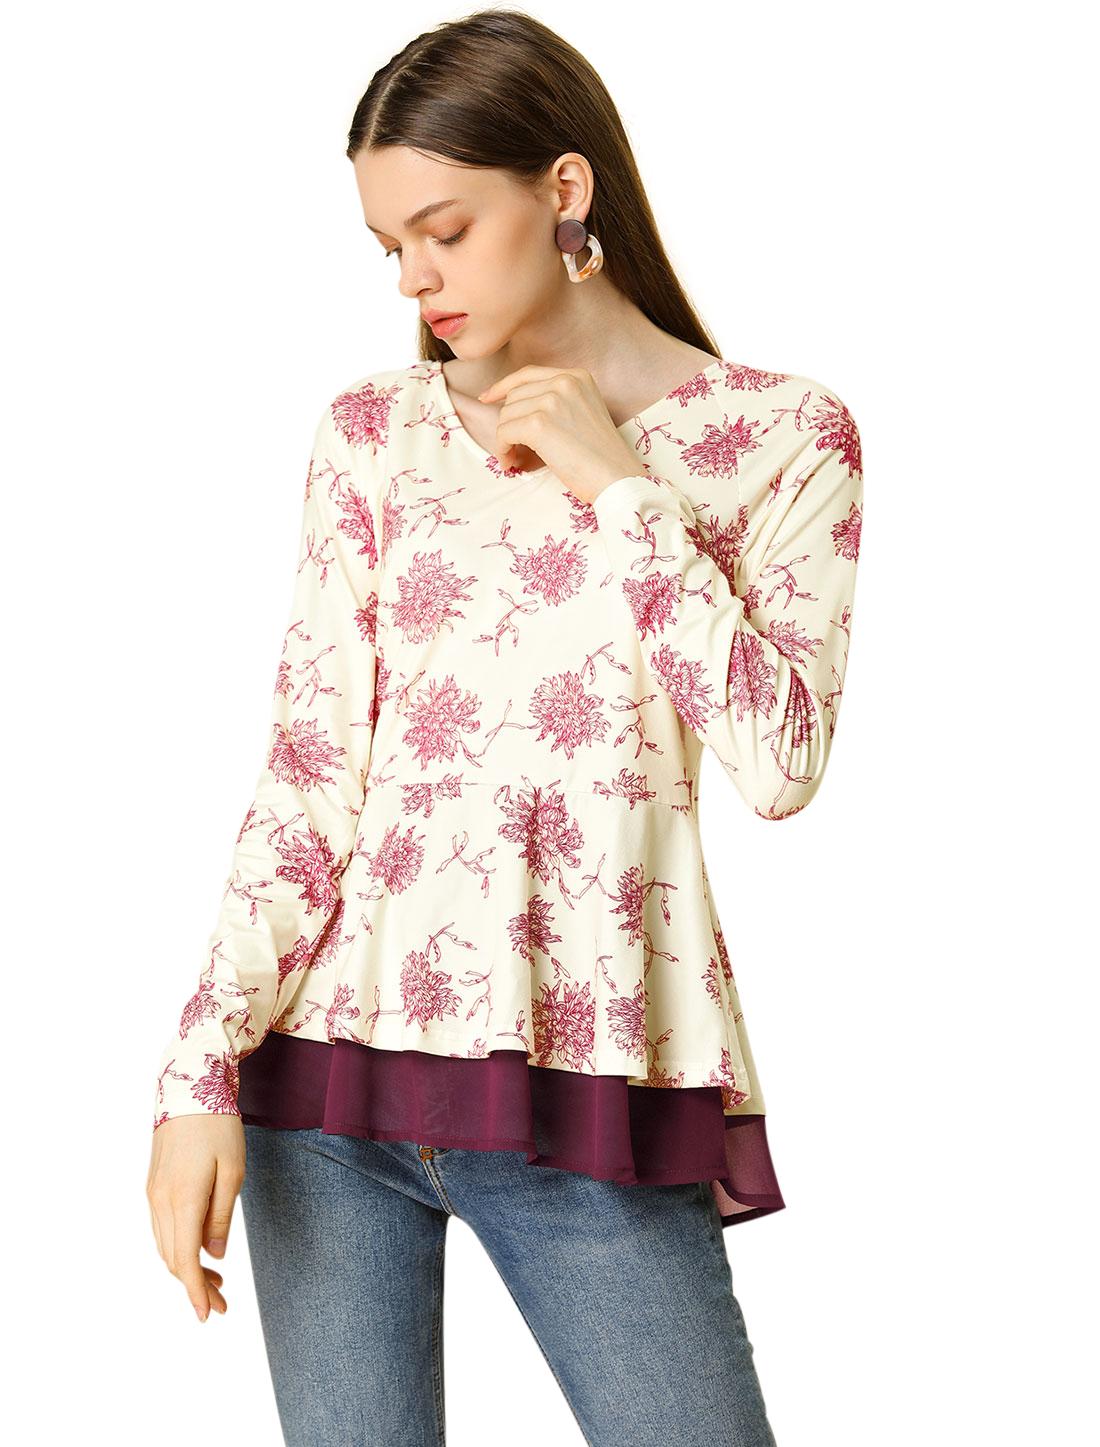 Allegra K Women's Floral V Neck Raglan Sleeve Ruffles Hem Top Loose Beige M